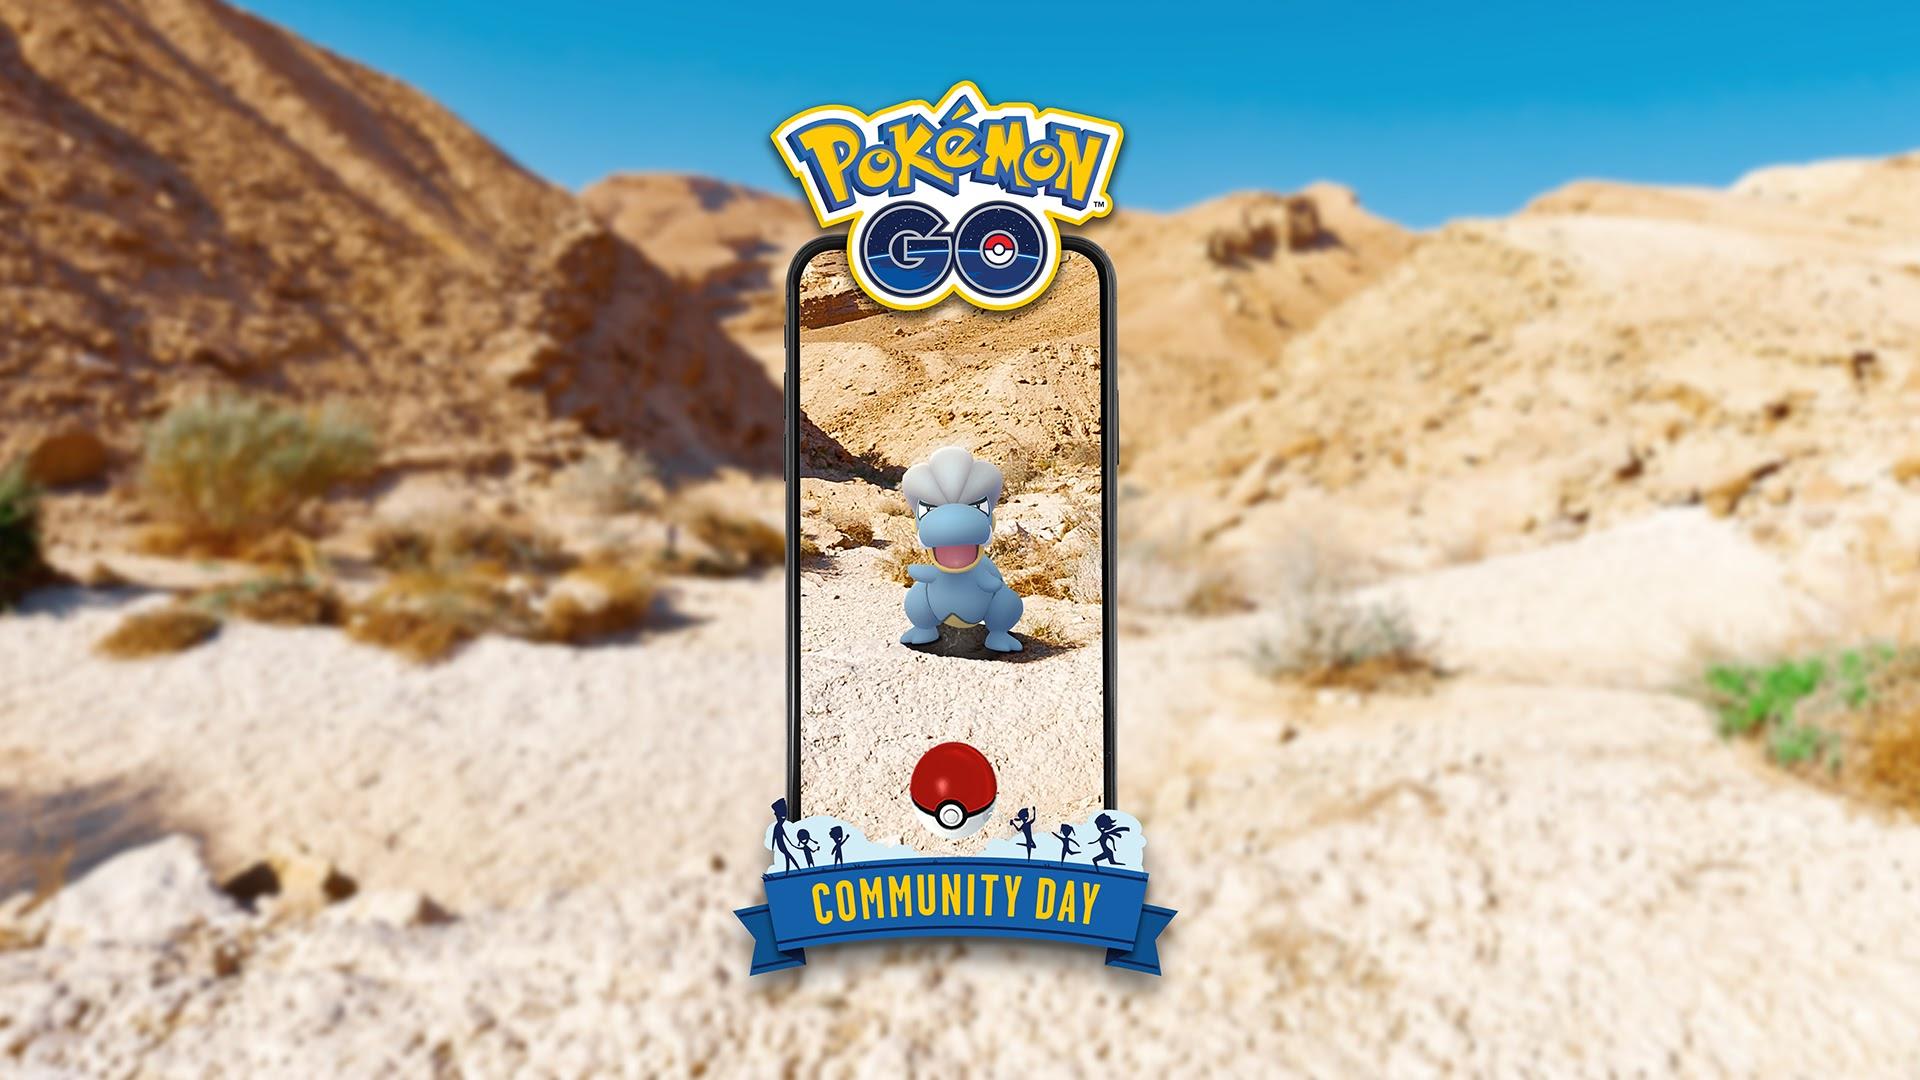 Pokemon GO's Bagon Community Day kicks off today